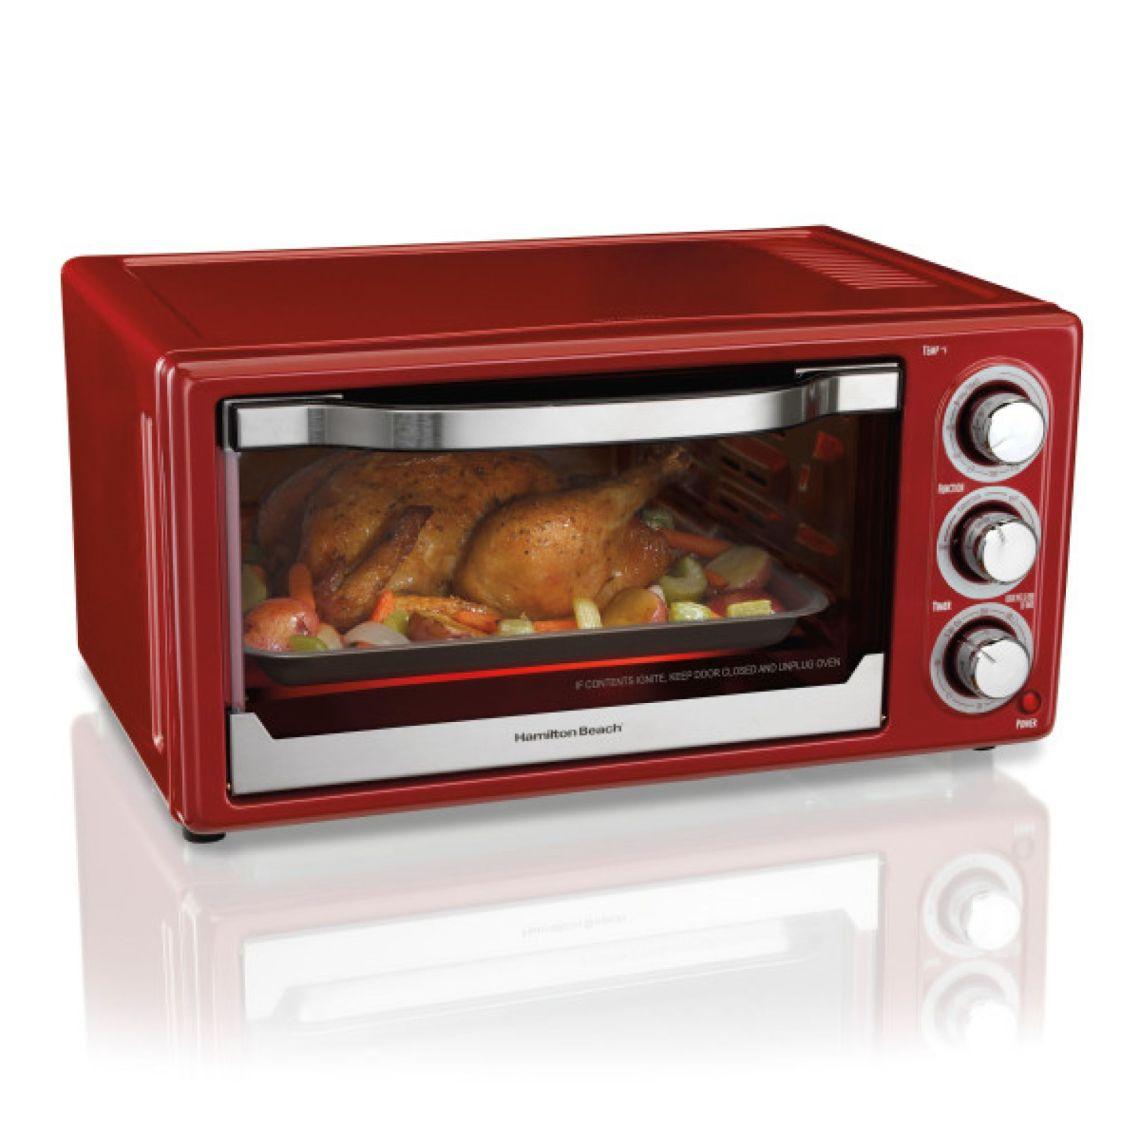 Hamilton Beach 6 Slice Toaster Convection/Broiler Oven | Red Model# 31514 - Walmart.com